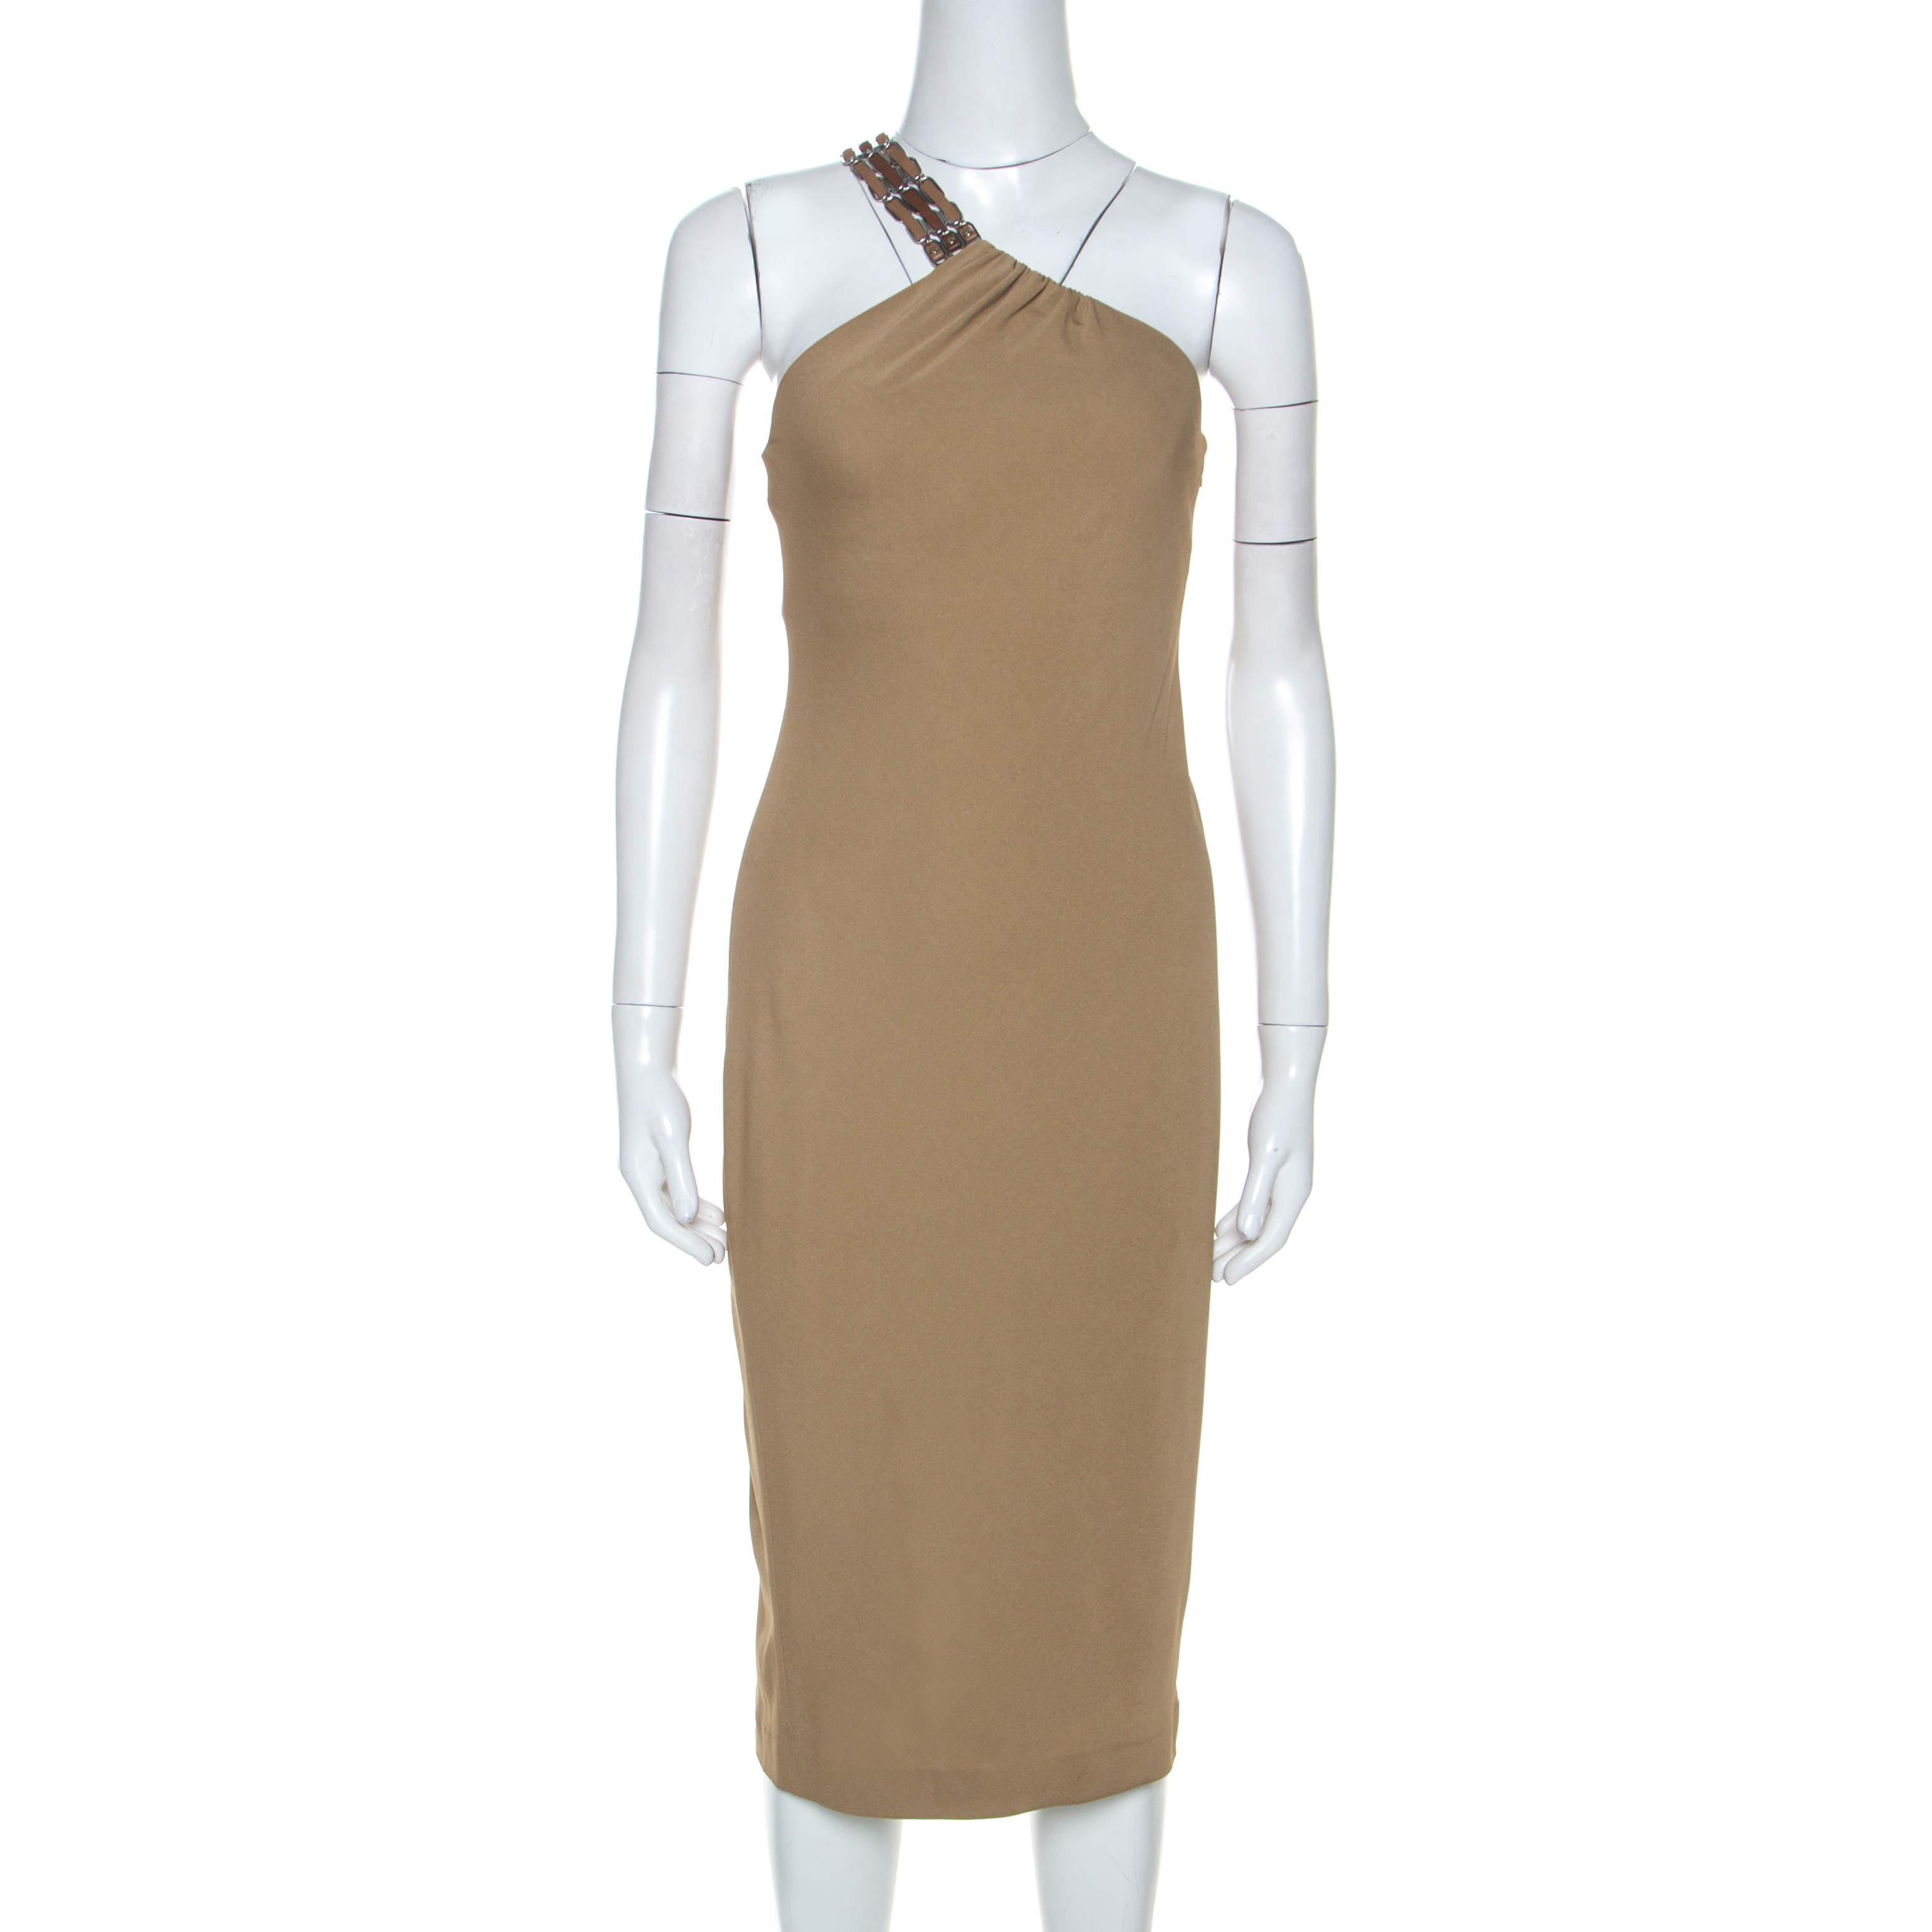 Ralph Lauren Khaki Stretch Knit One Shoulder Midi Dress S